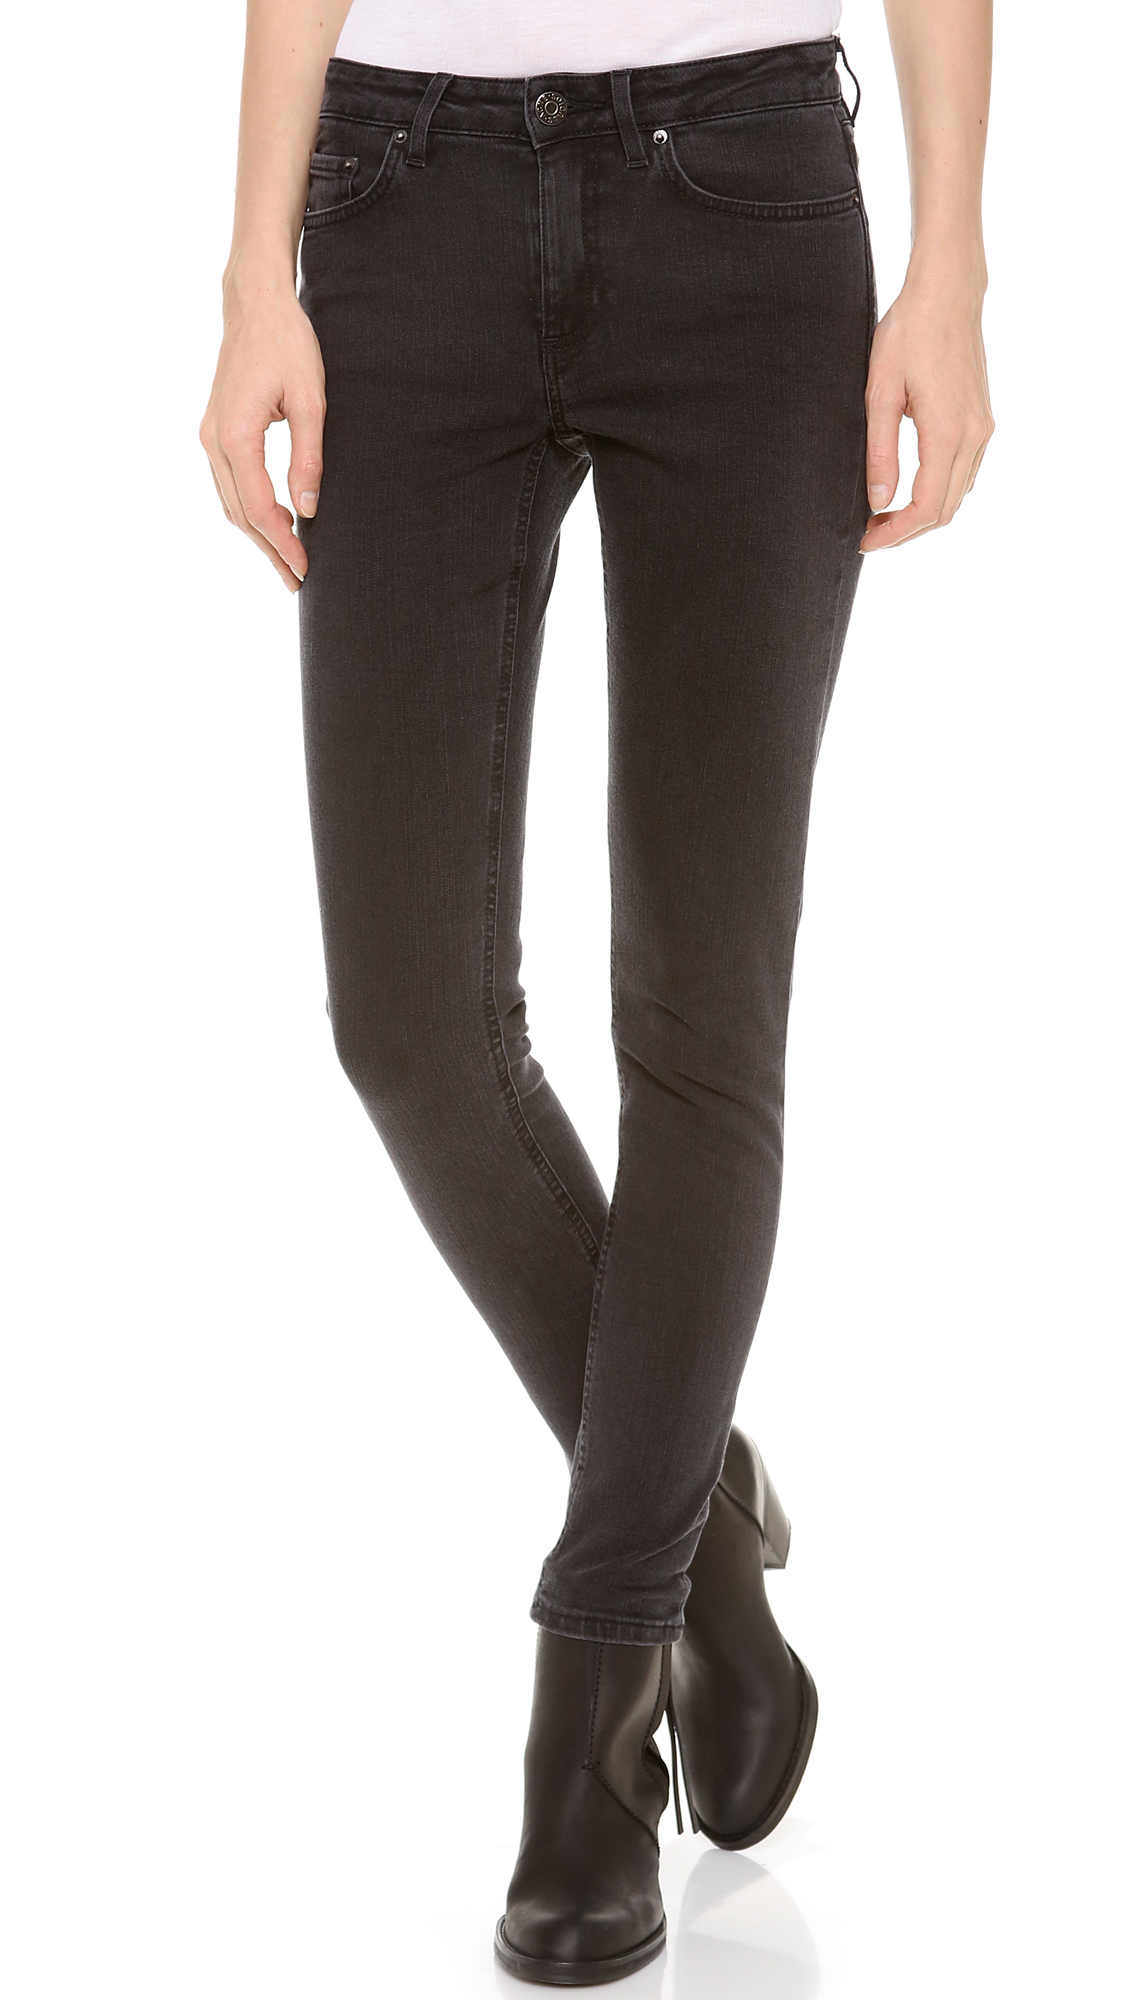 Acne Studios Skin 5 Jeans   SHOPBOP 1a8c5dafcd